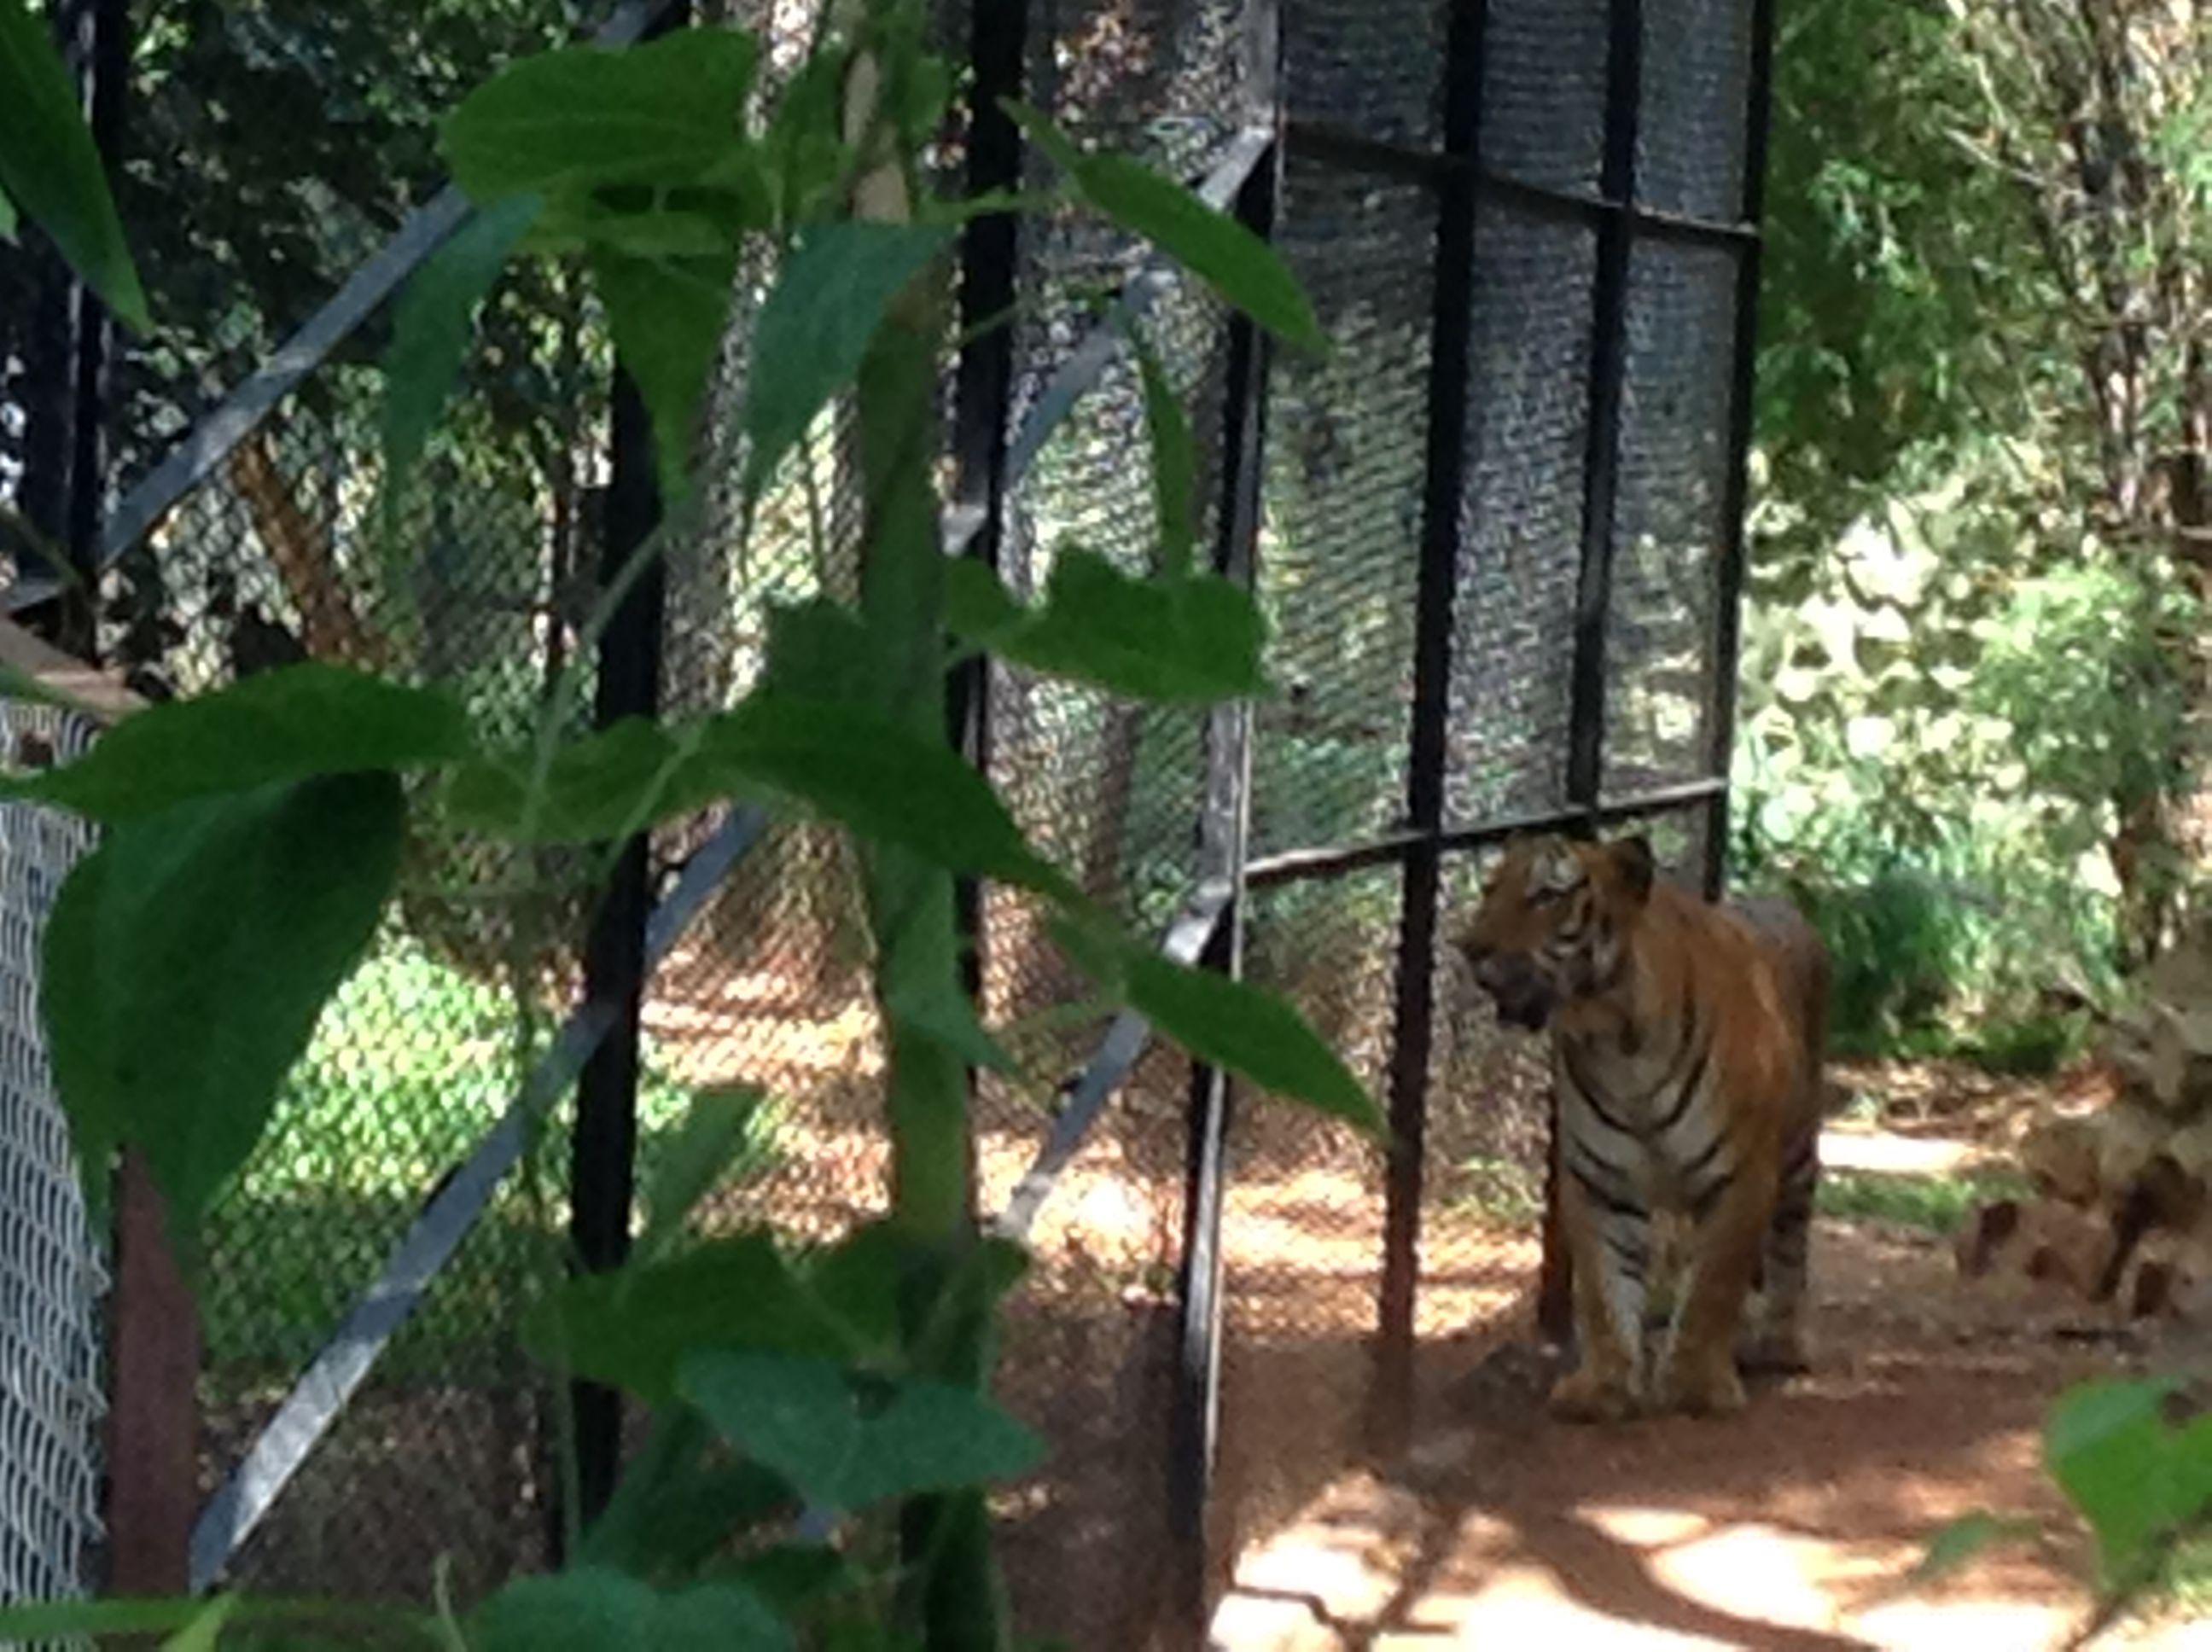 12b48866dfc1526154907b1864eaae8e - Mysore Zoo Sri Chamarajendra Zoological Gardens